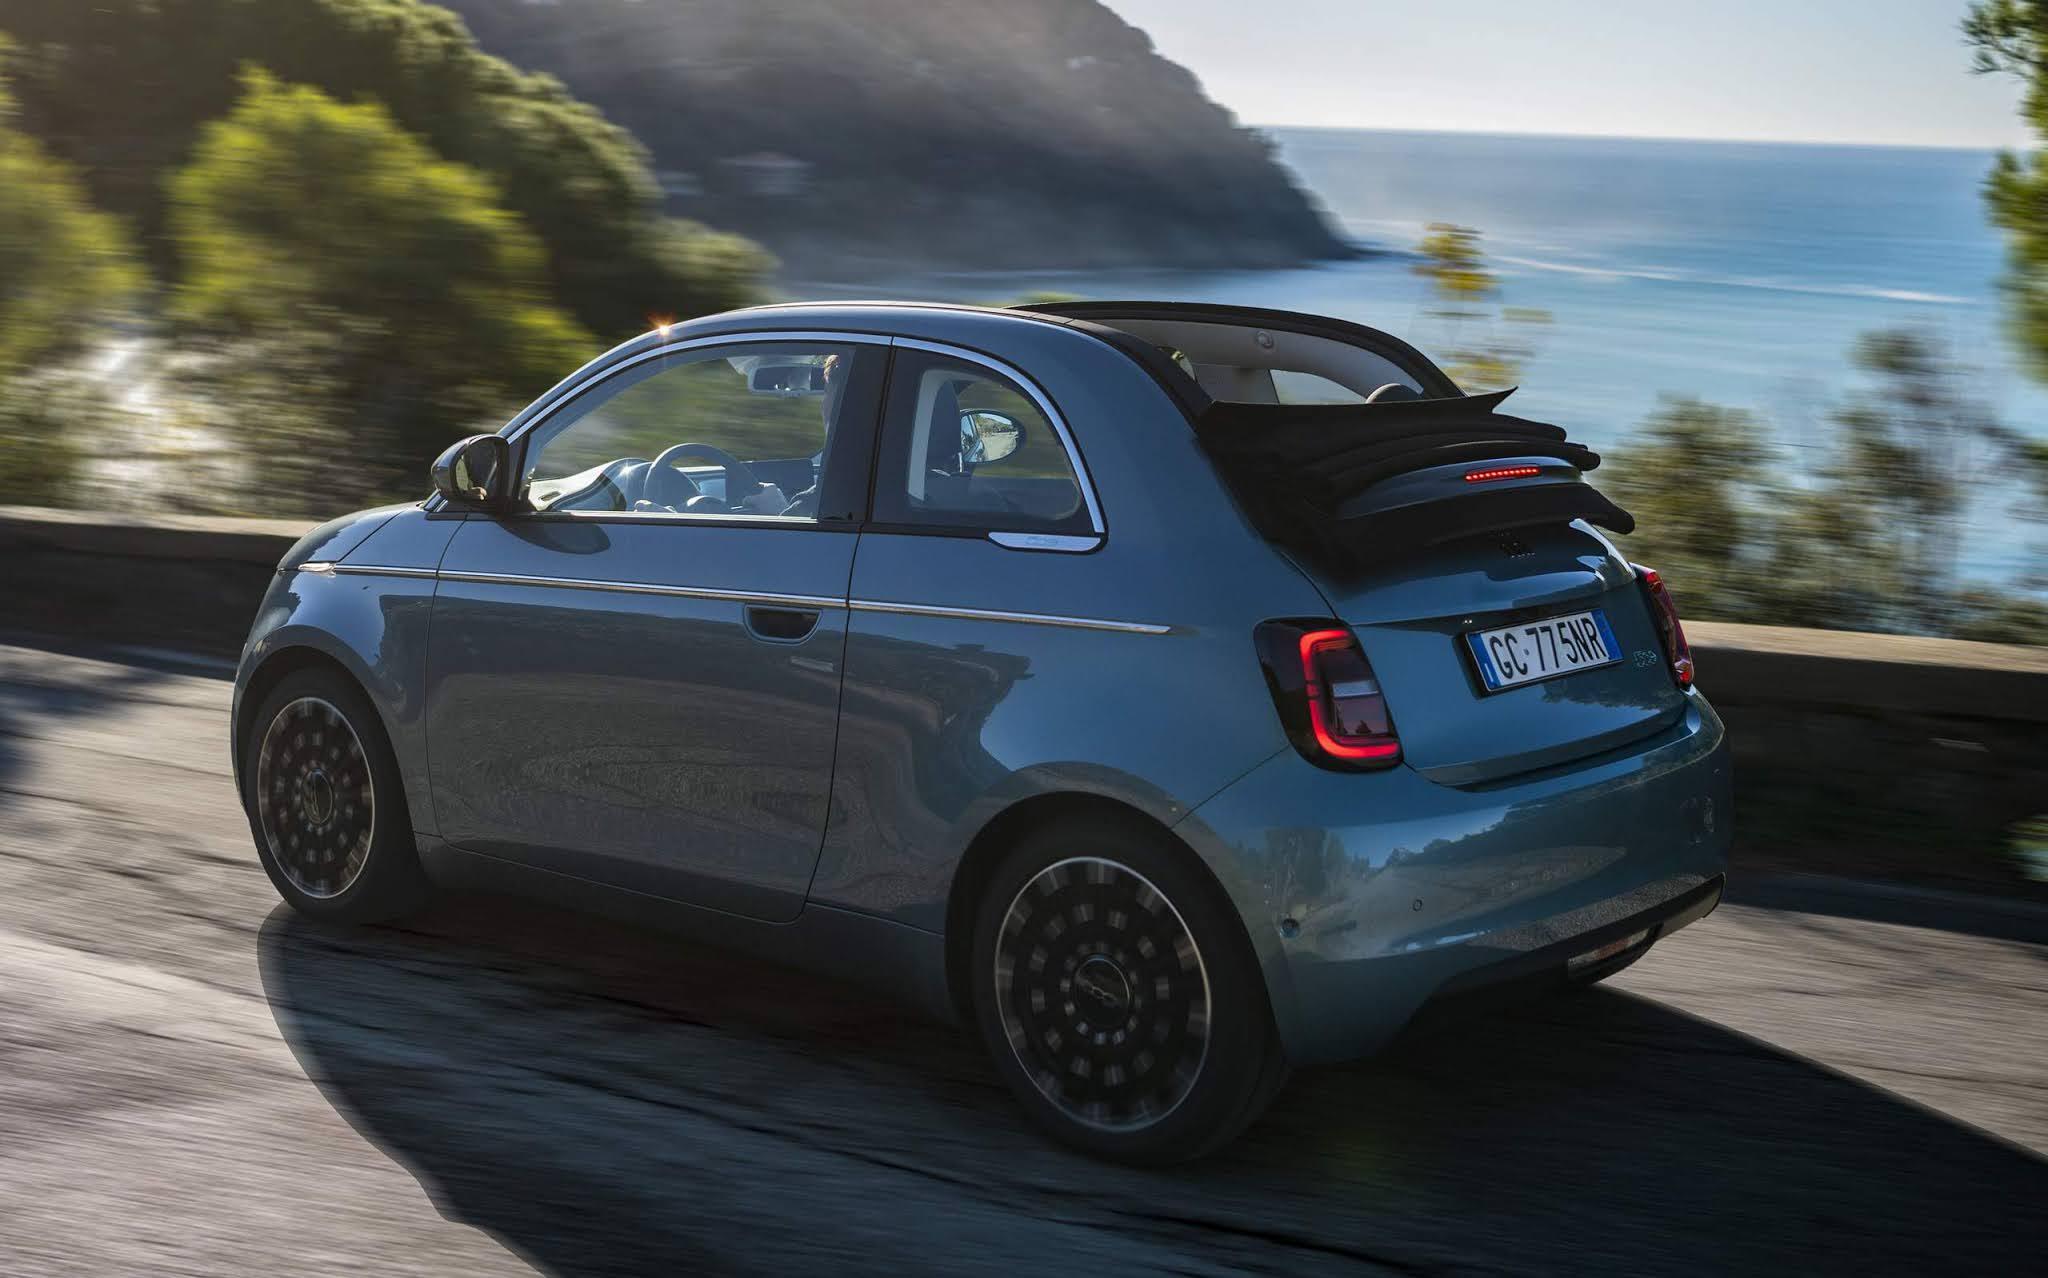 Stellantis confirma lançamento de modelos elétricos da Fiat, Jeep, Peugeot e Citroen no Brasil